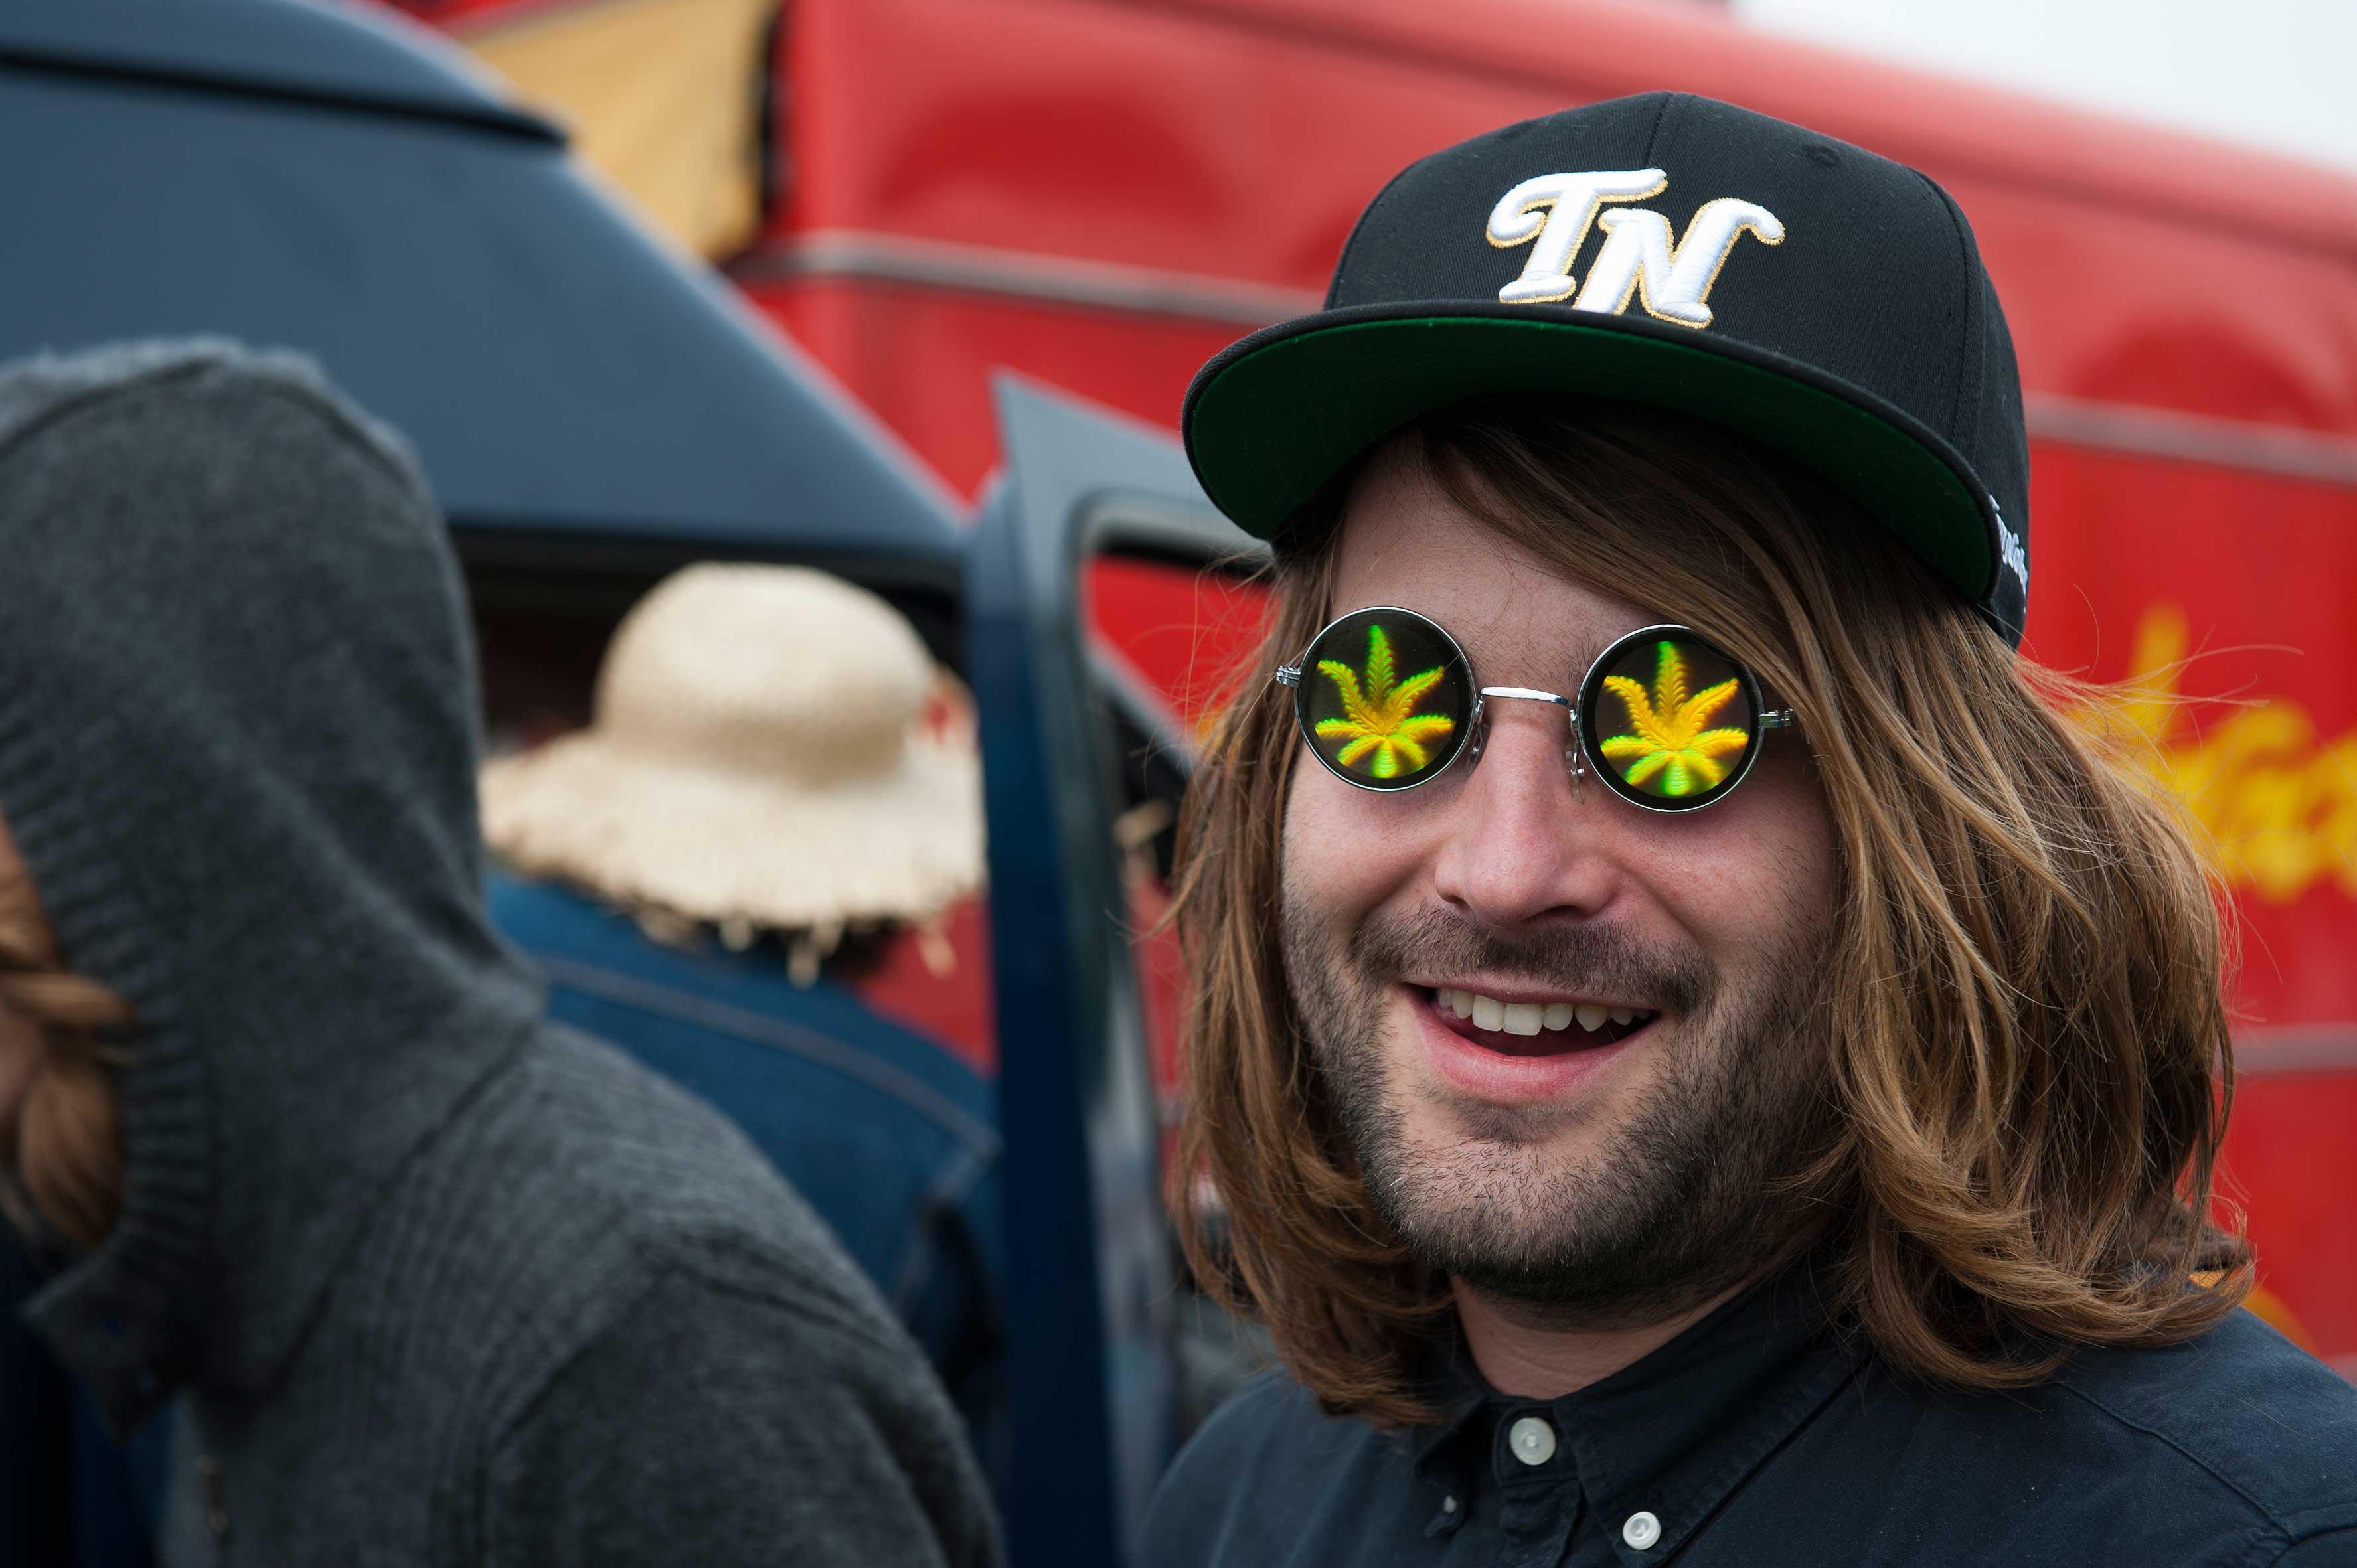 http://www.dutch-passion.nl/img/nieuws_org/Cannabis%20Bevrijdingsdag%202013%205.jpg